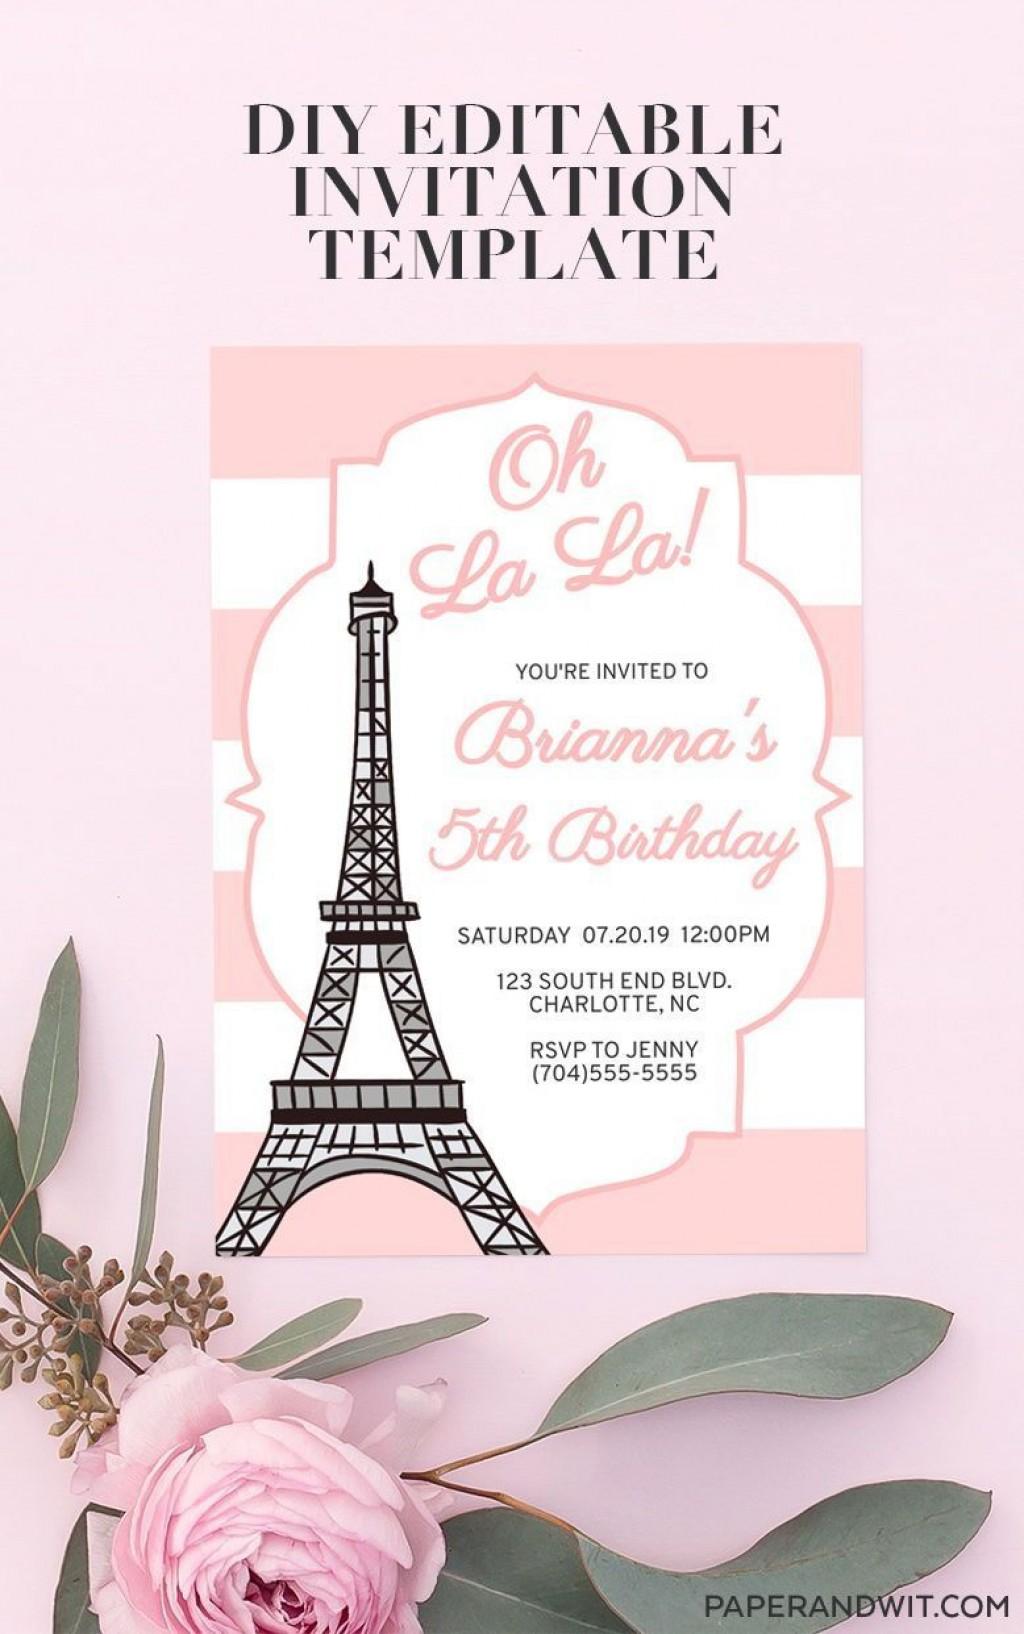 003 Formidable Pari Birthday Invitation Template Free Inspiration Large